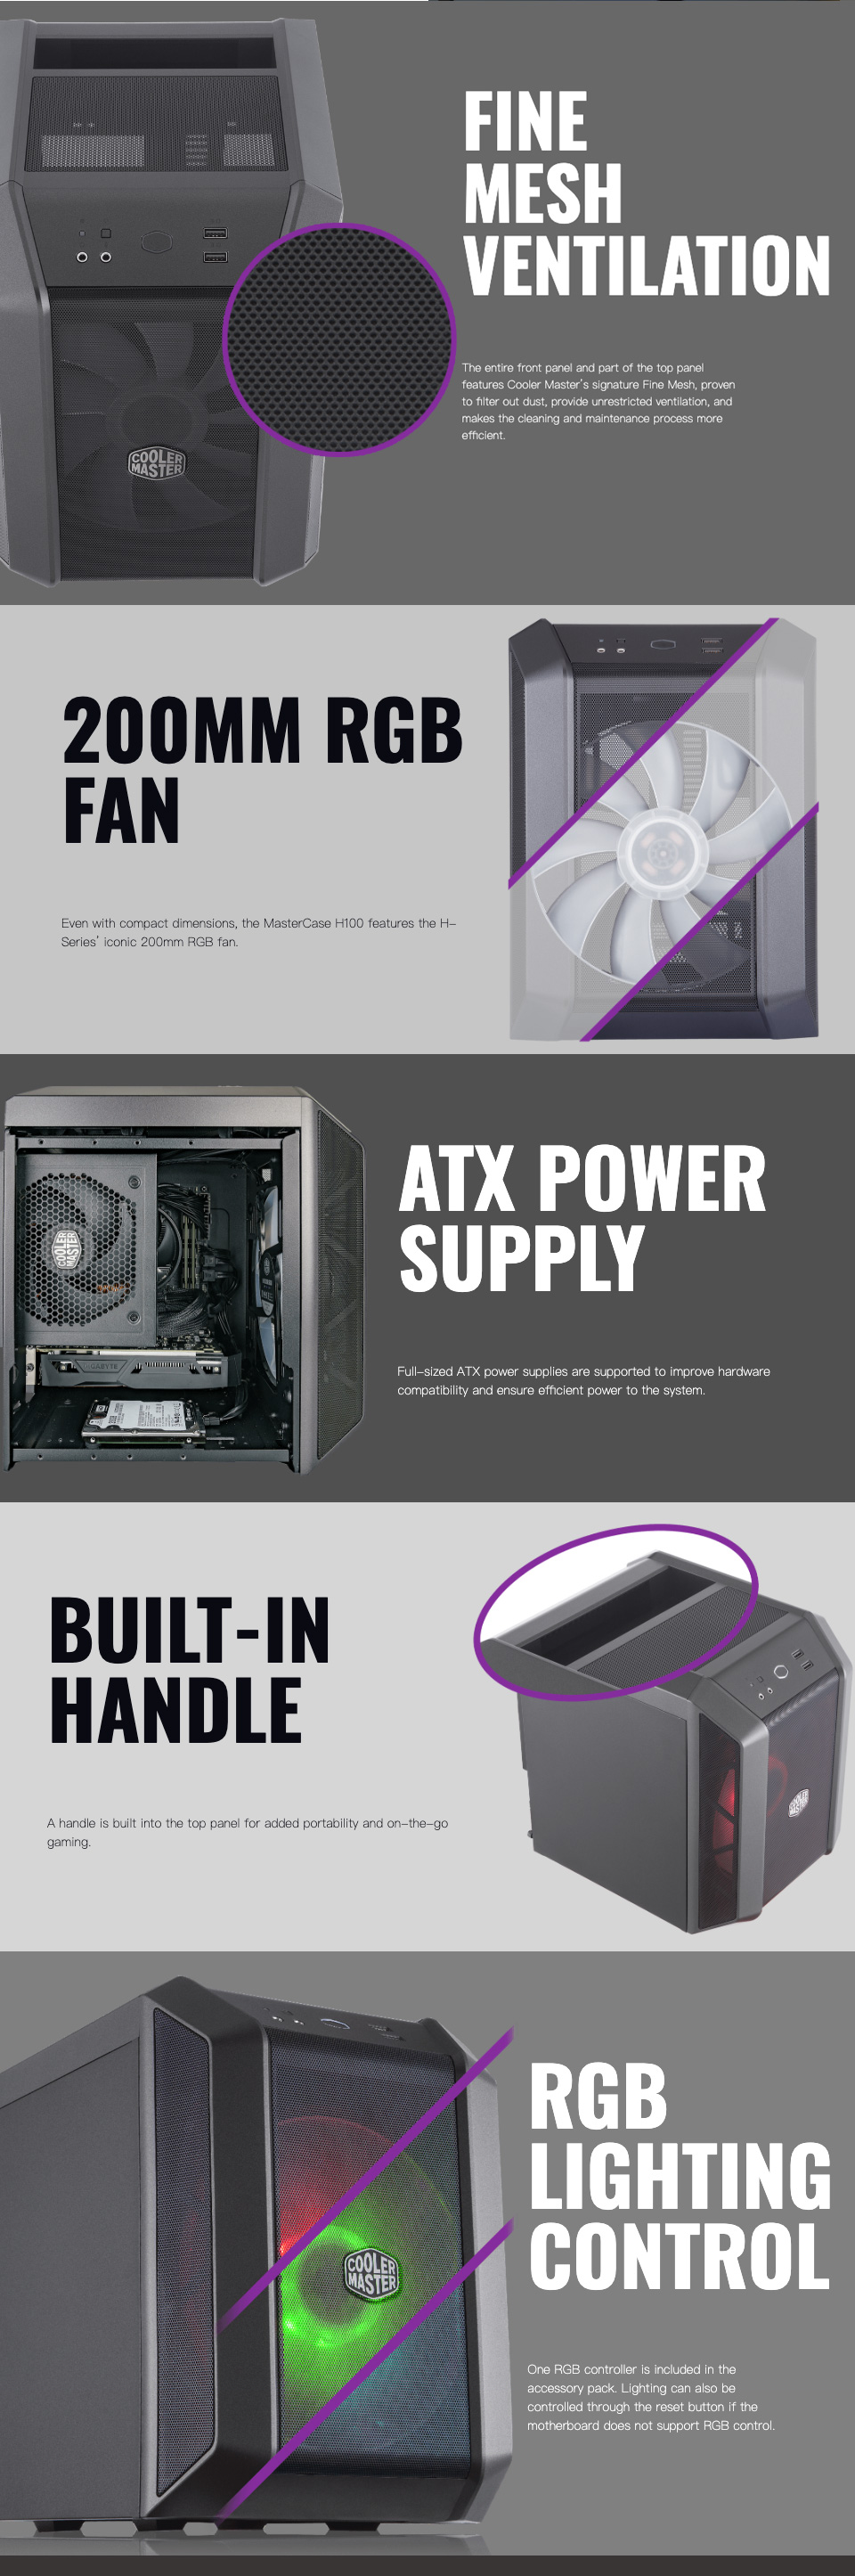 Cooler Master MasterCase H100 Mini-ITX Case features 2